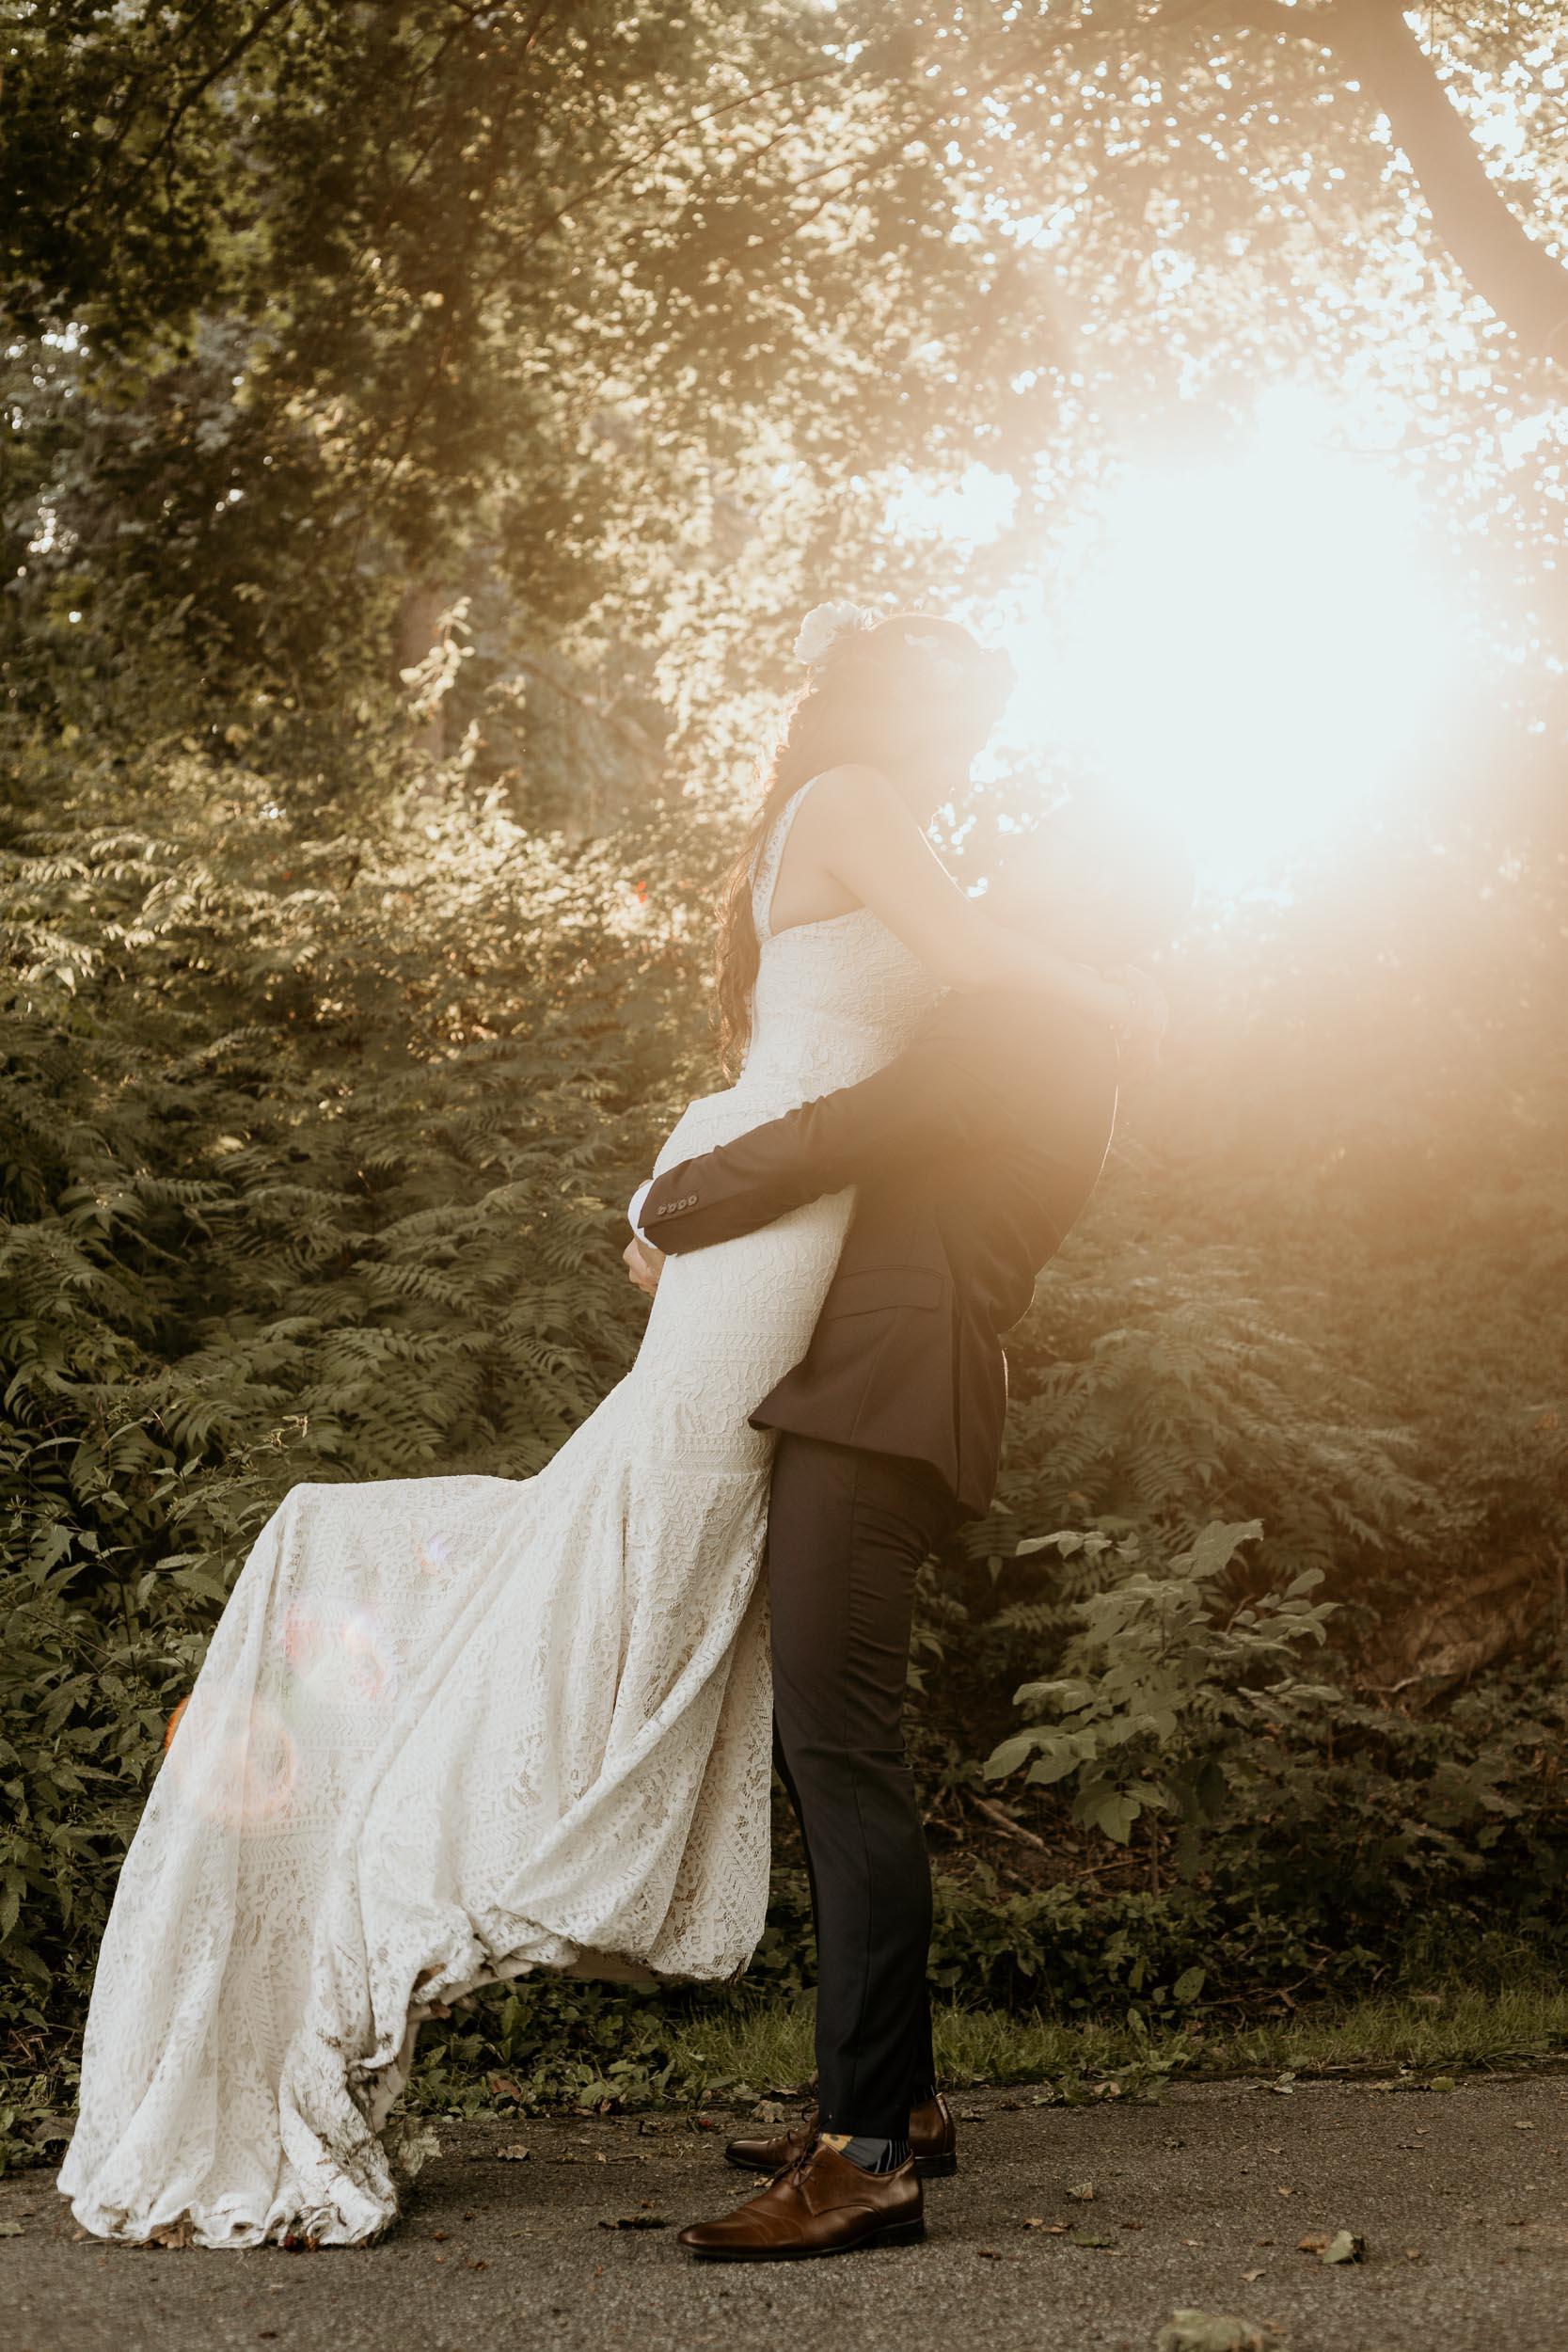 intimate-wedding-elopement-photographer-ottawa-toronto-8023.jpg